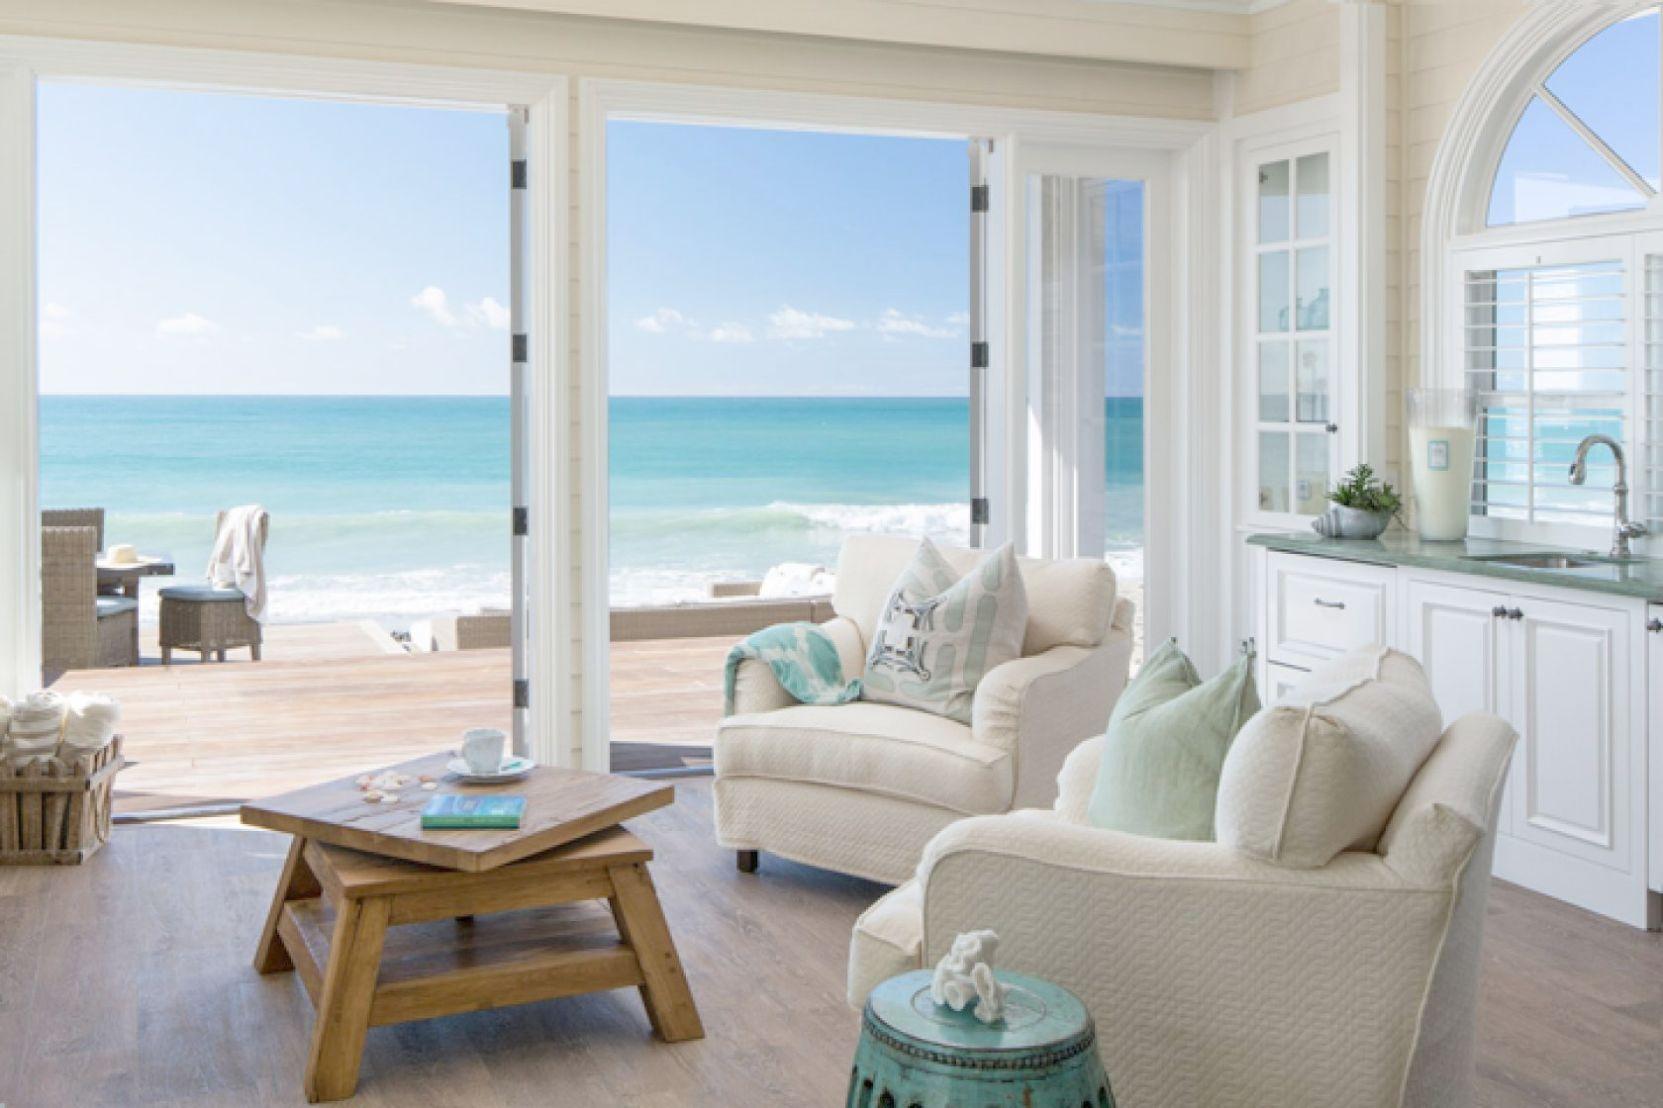 Coastal style home decor modern beach house with minimalist interior design sweden